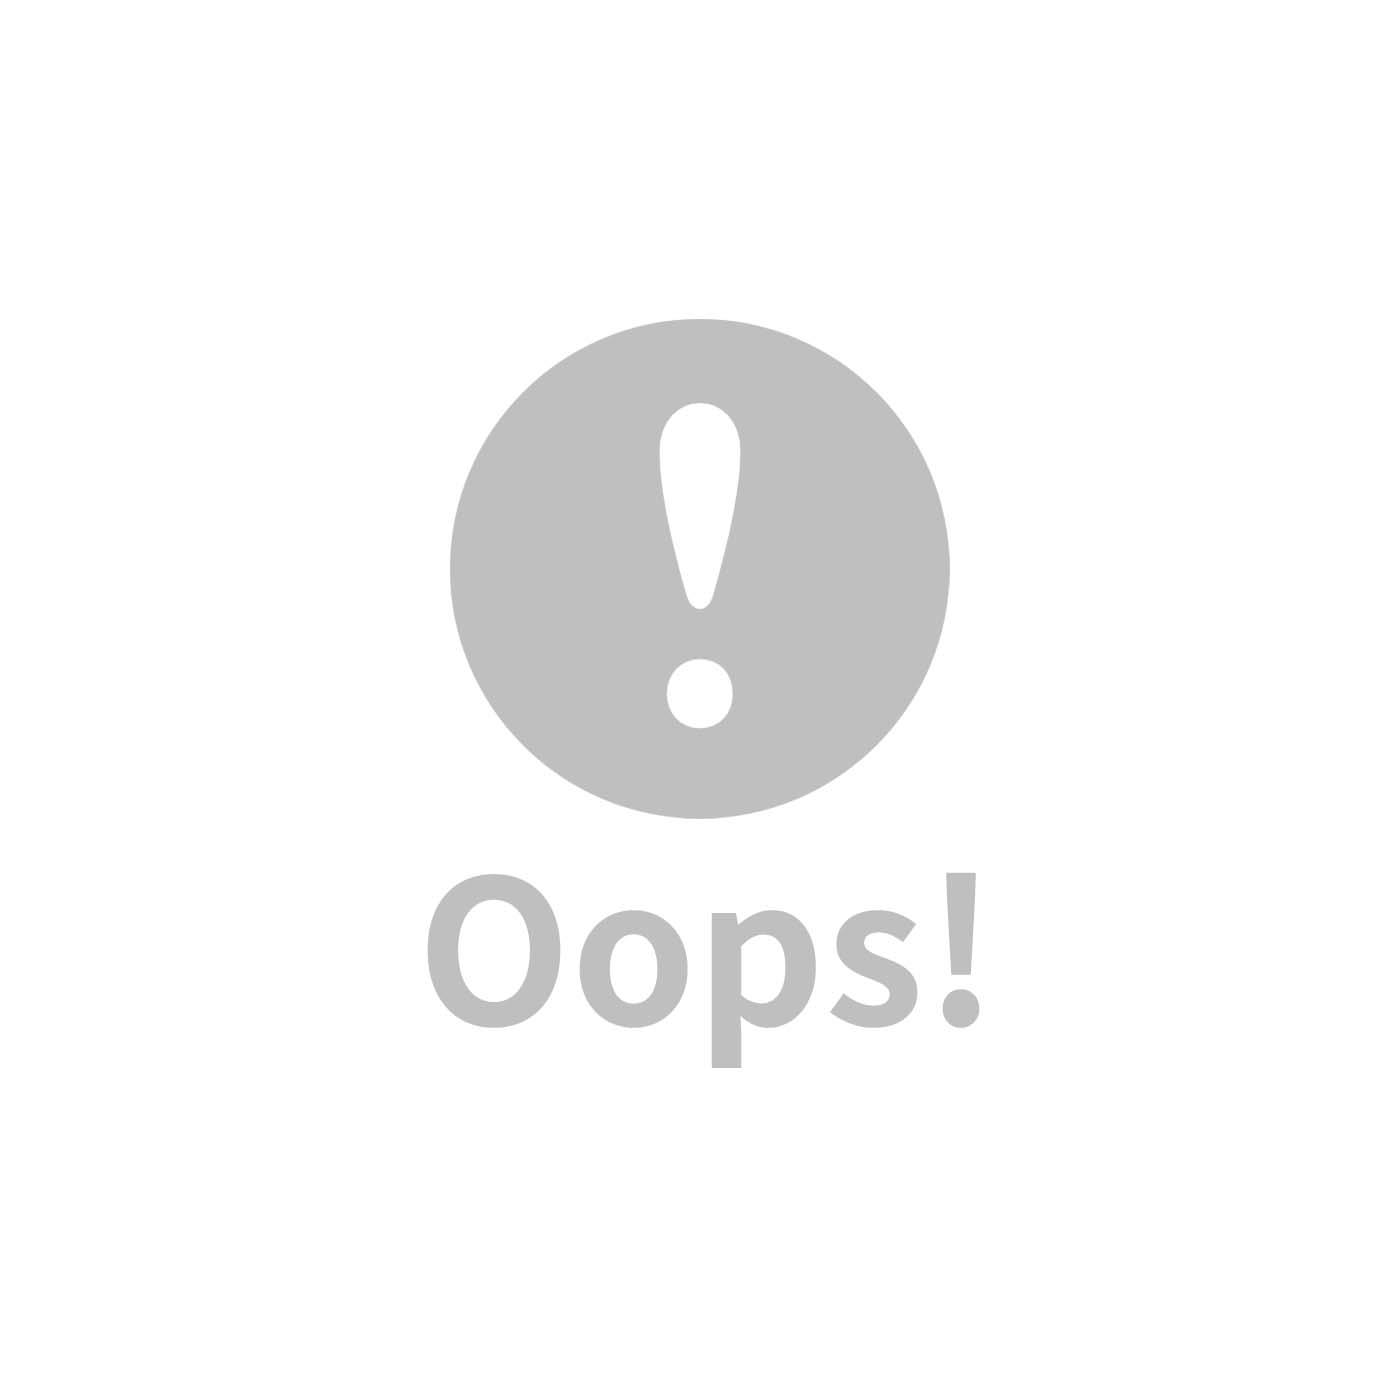 global affairs 童話手工編織乖乖兔音樂鈴-蜜桃粉